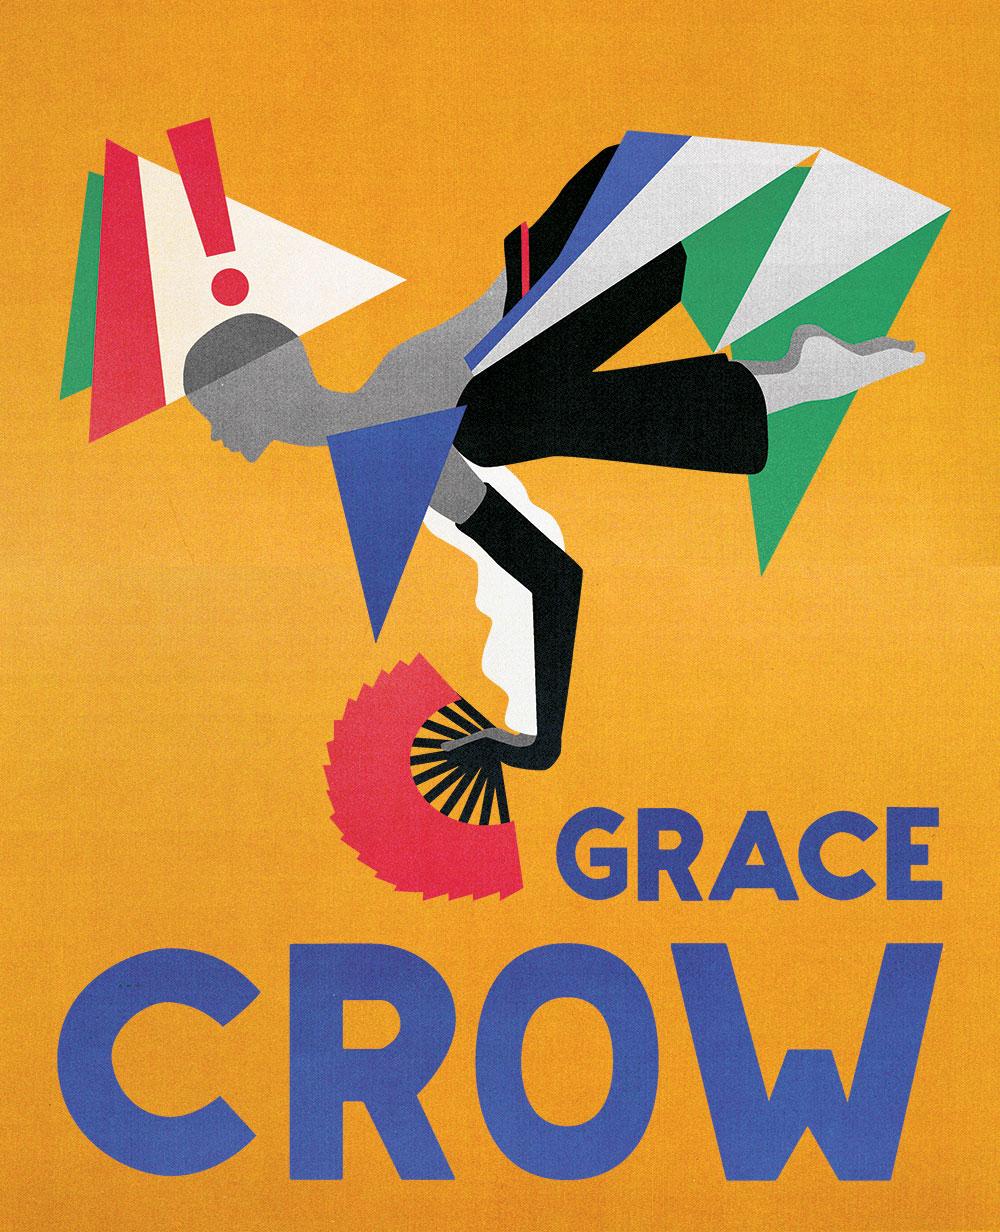 GraceCrow_1000.jpg